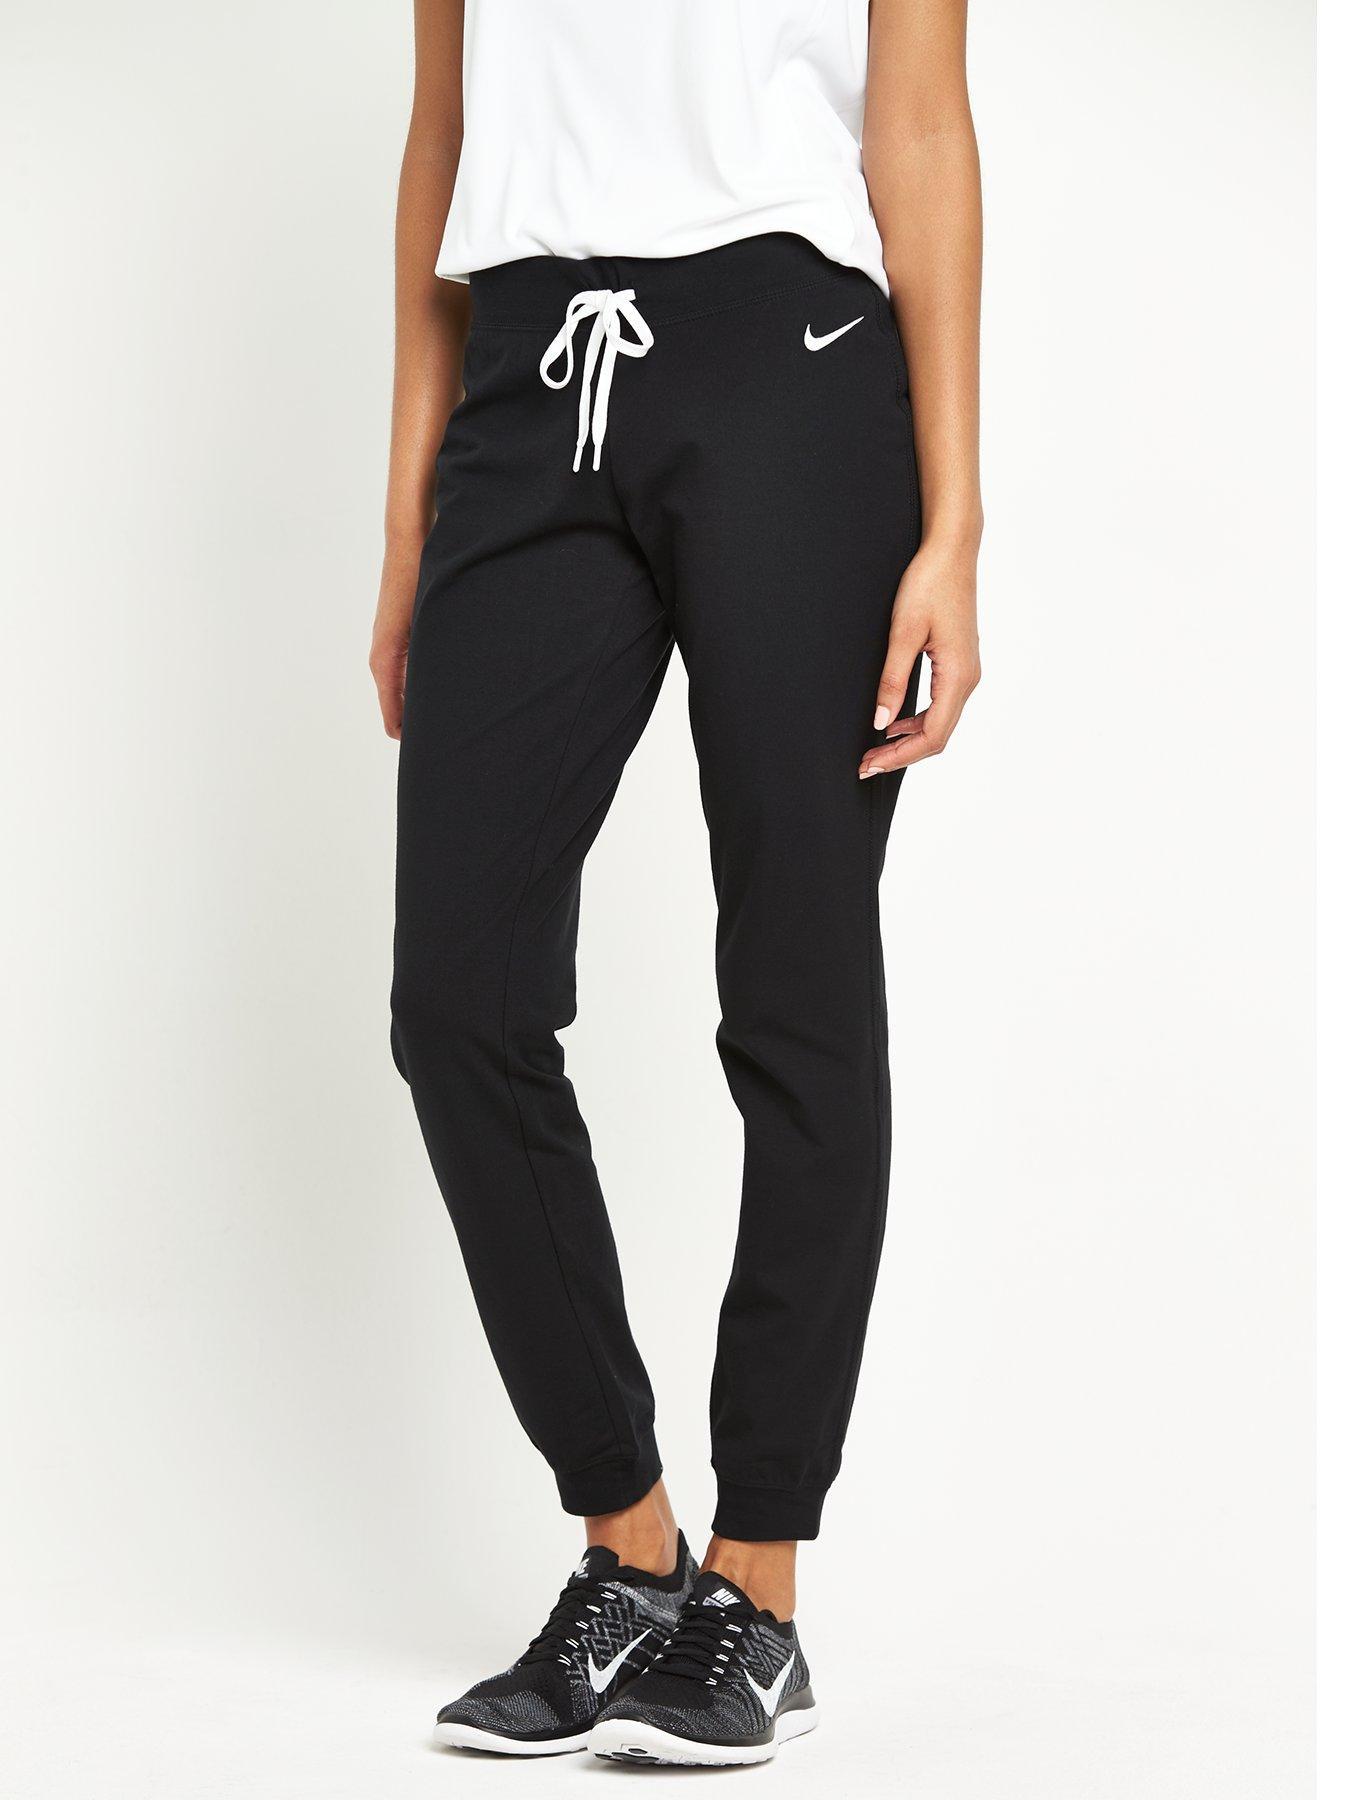 Adidas Cuffed Pants Womens Customize Adidas Crazy 8